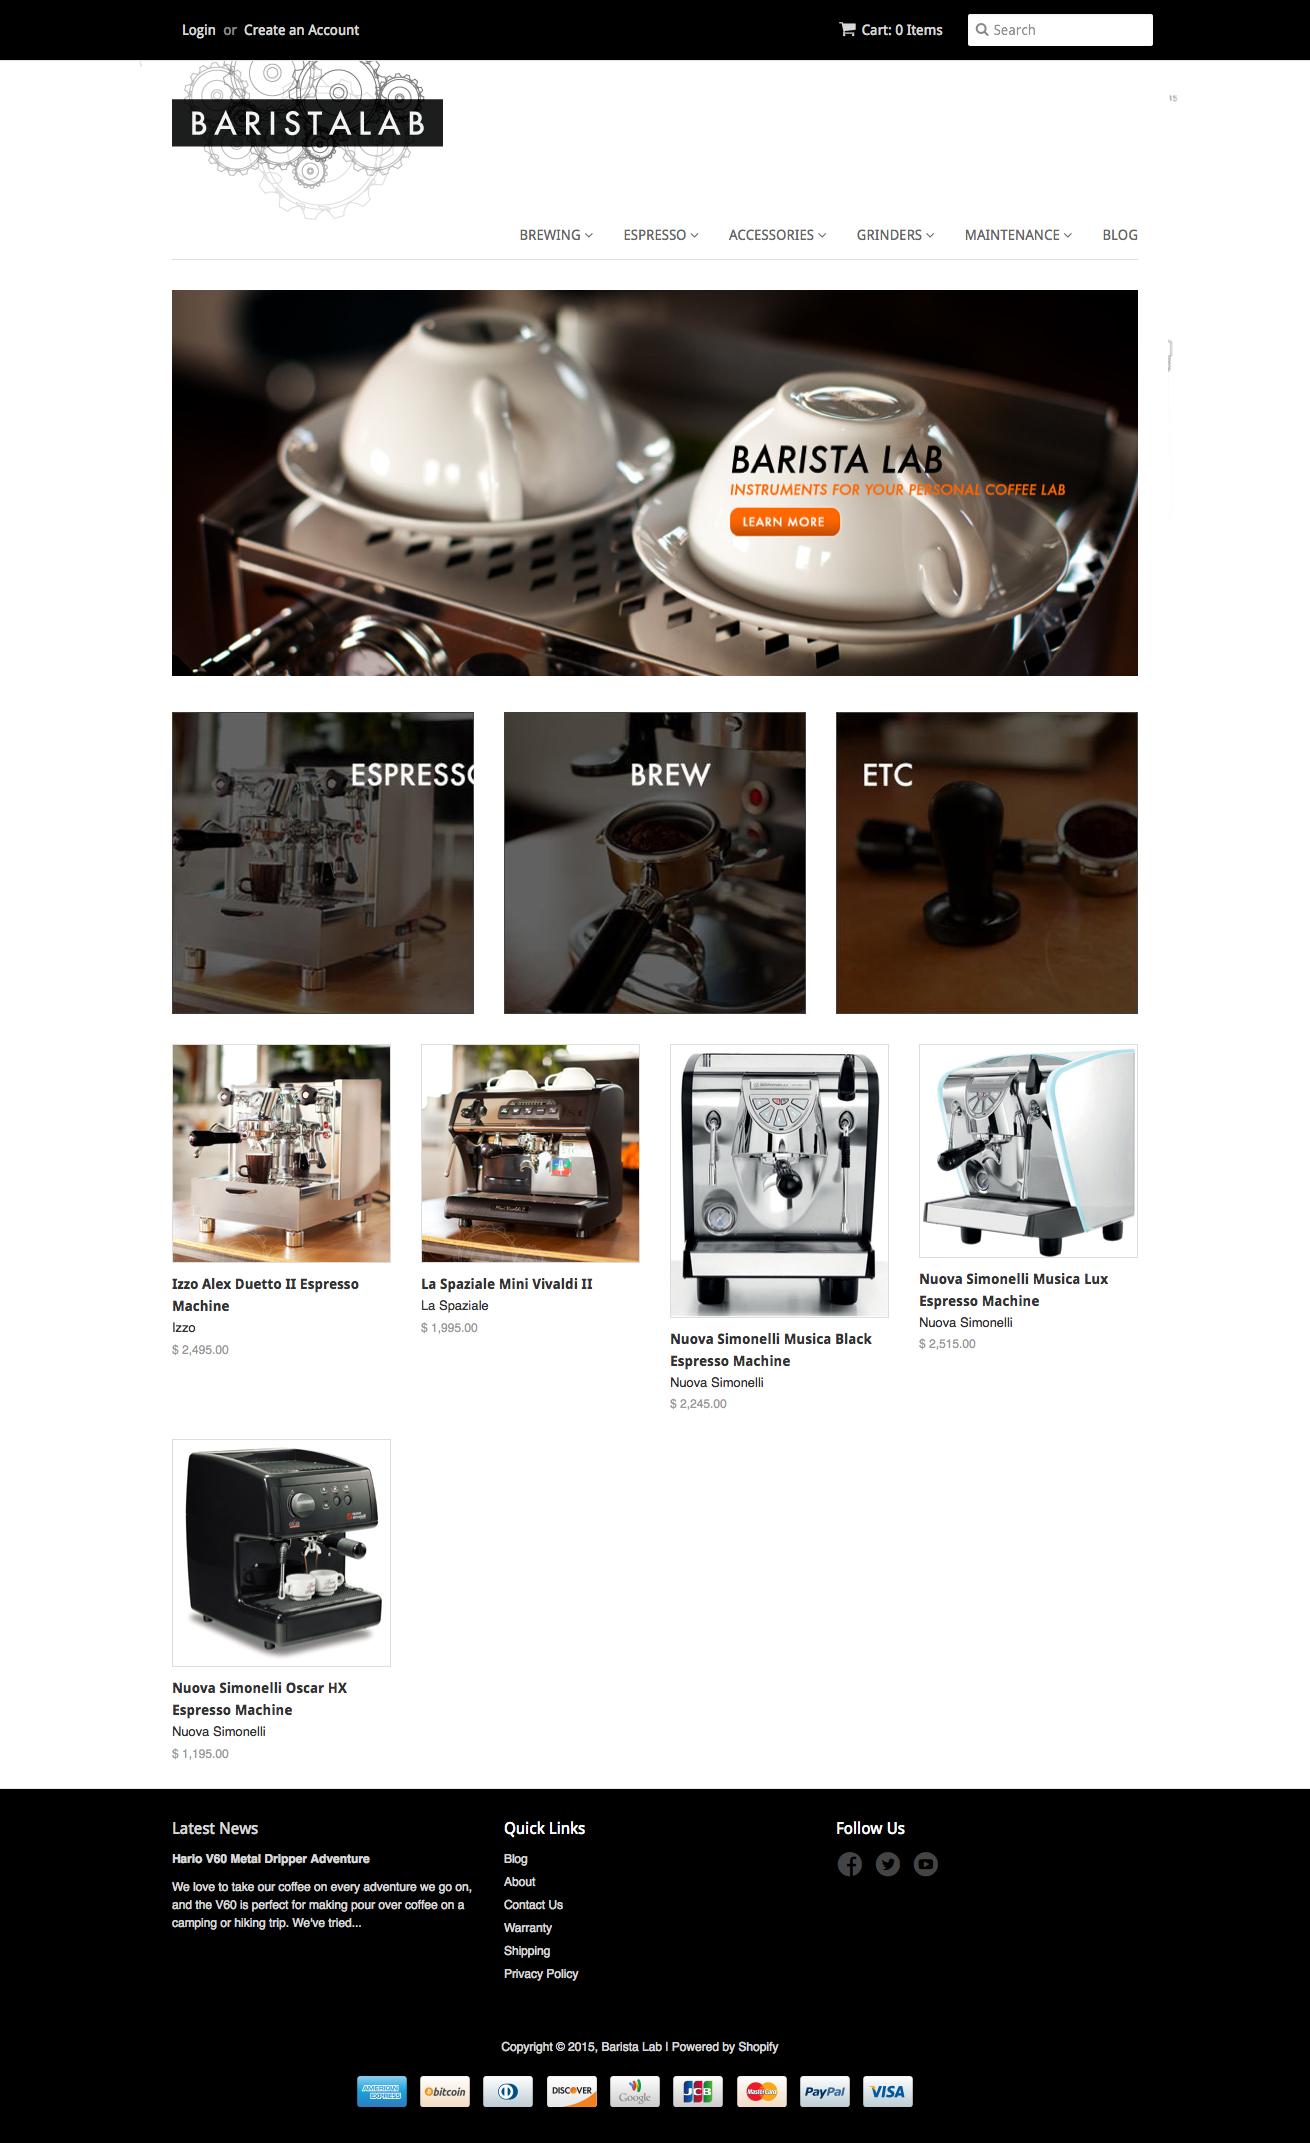 baristalab.com